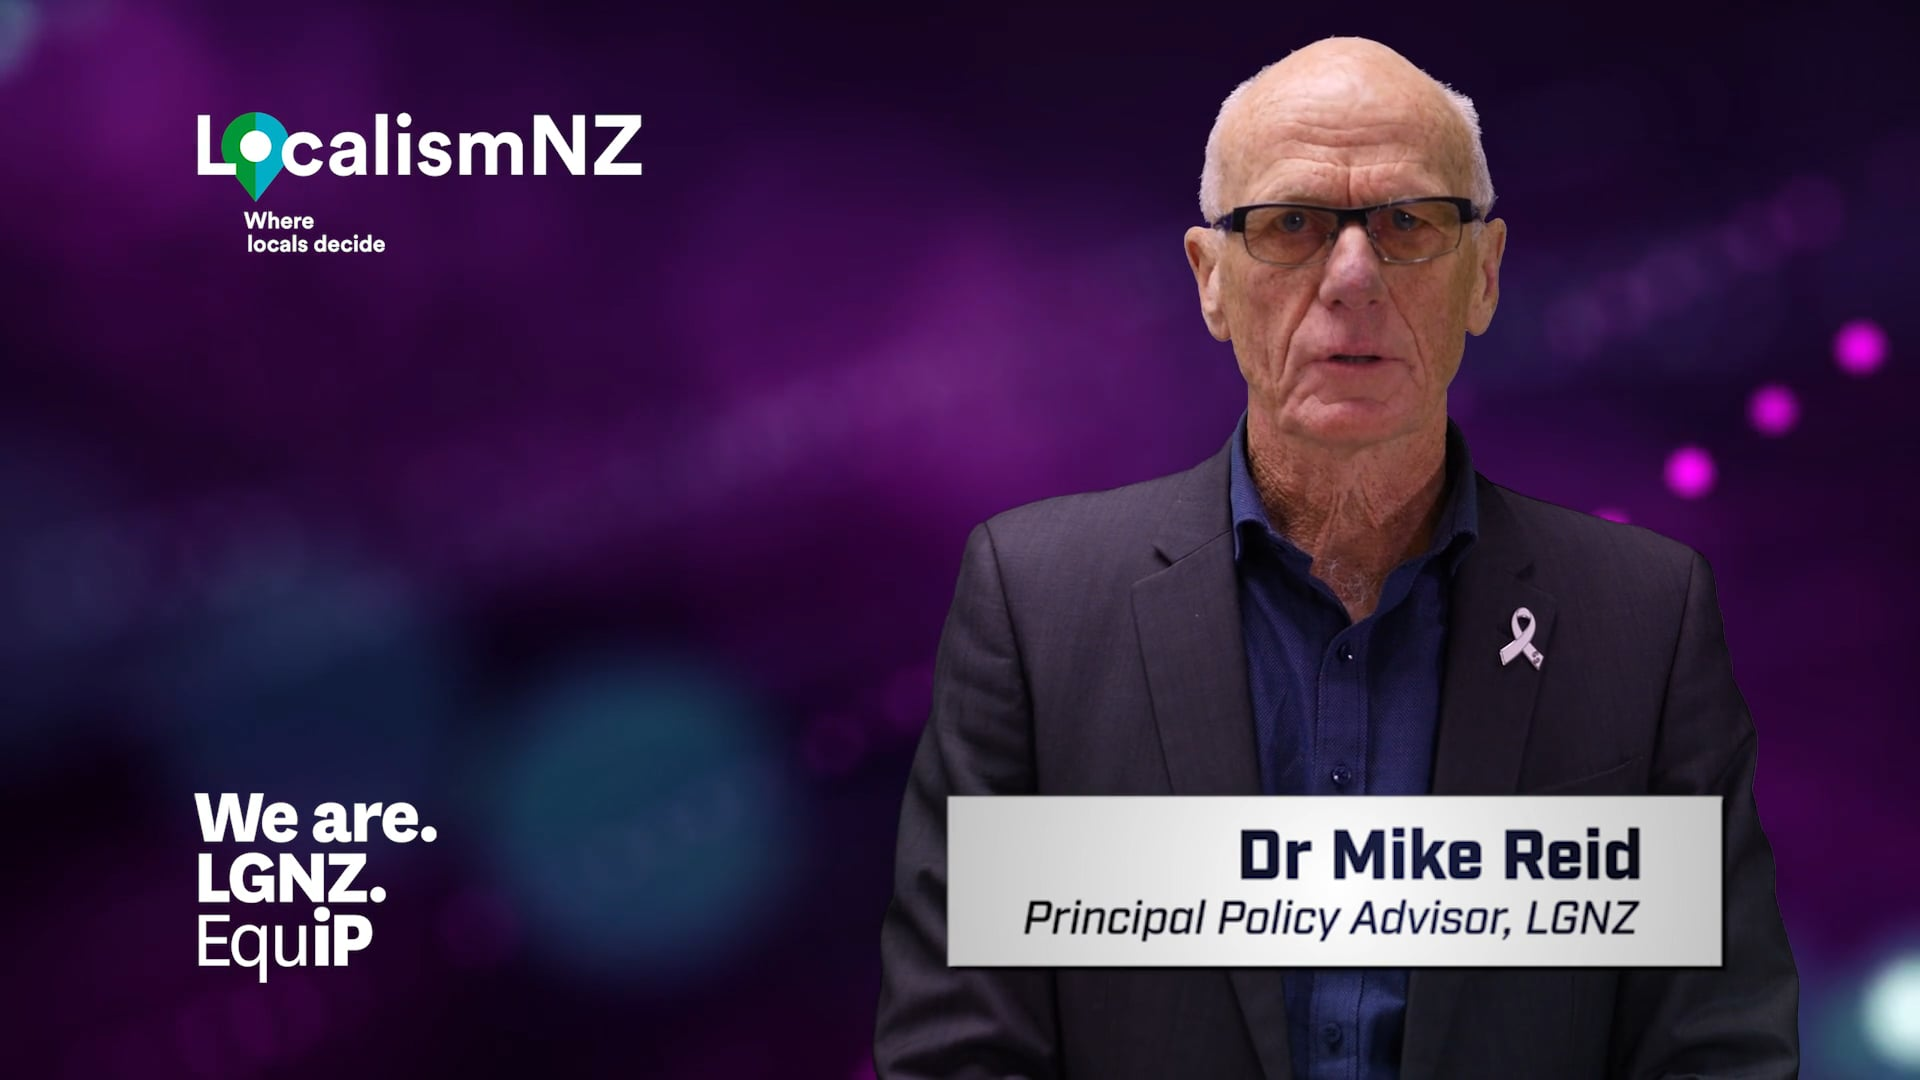 Dr Mike Reid, Principal Policy Advisor, LGNZ